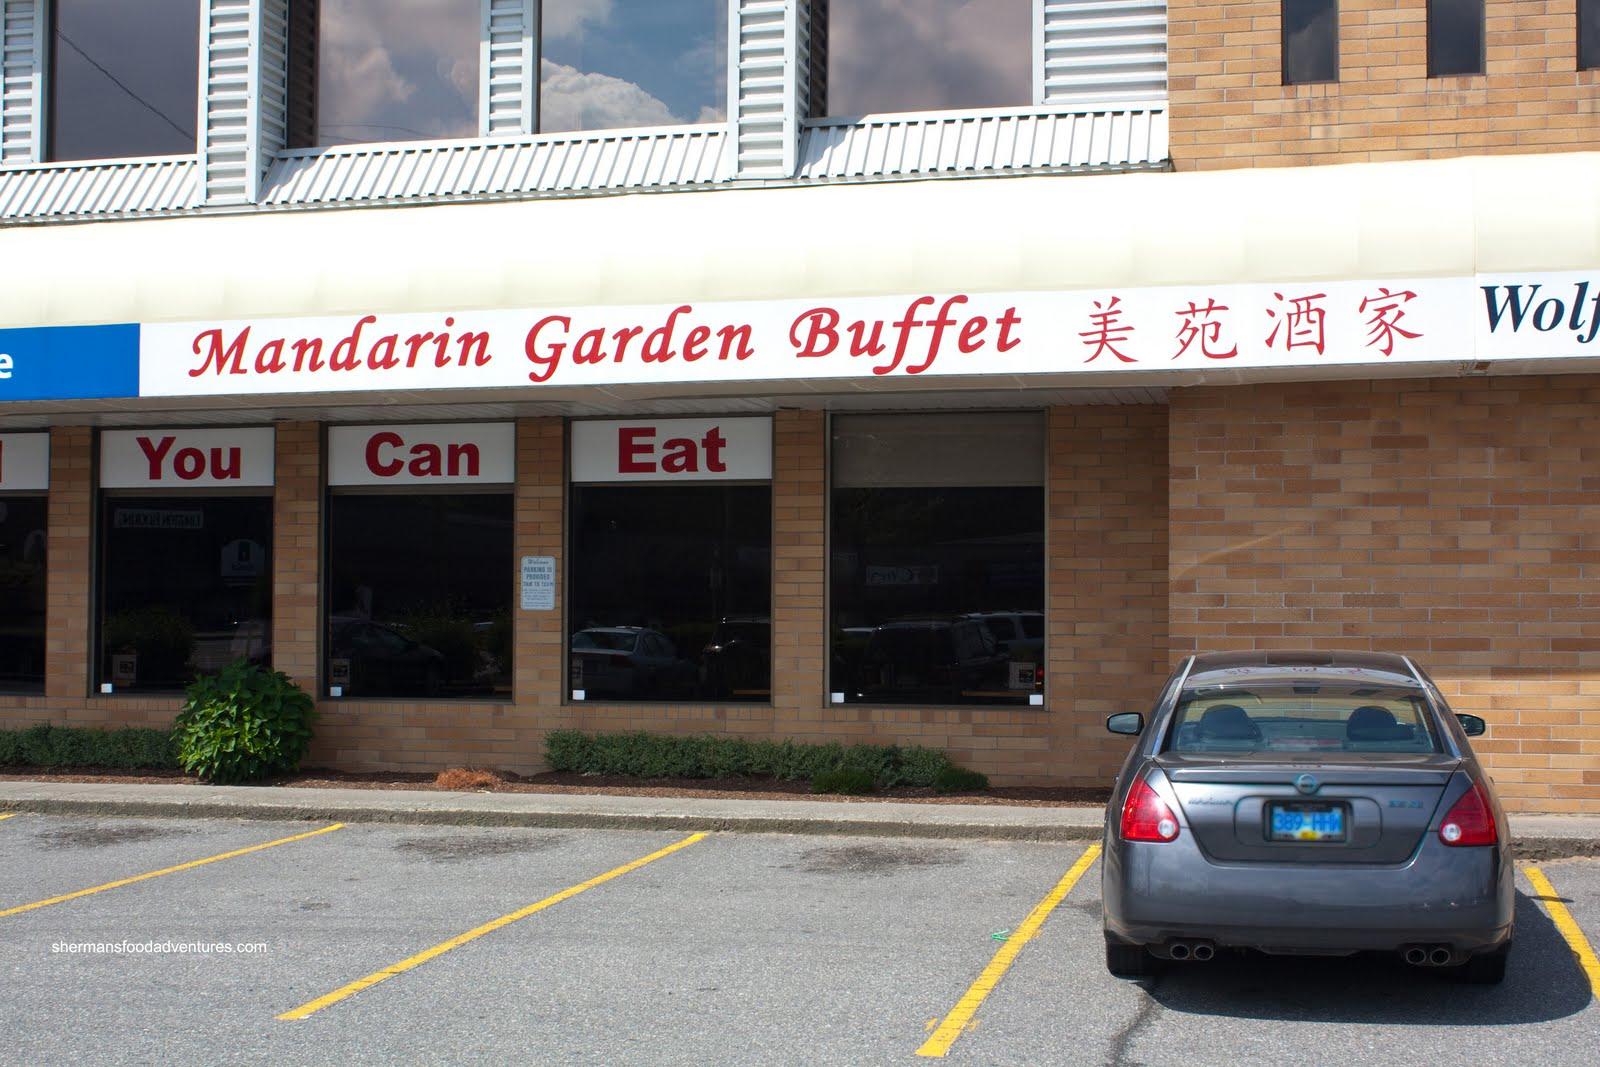 Sherman 39 S Food Adventures Mandarin Garden